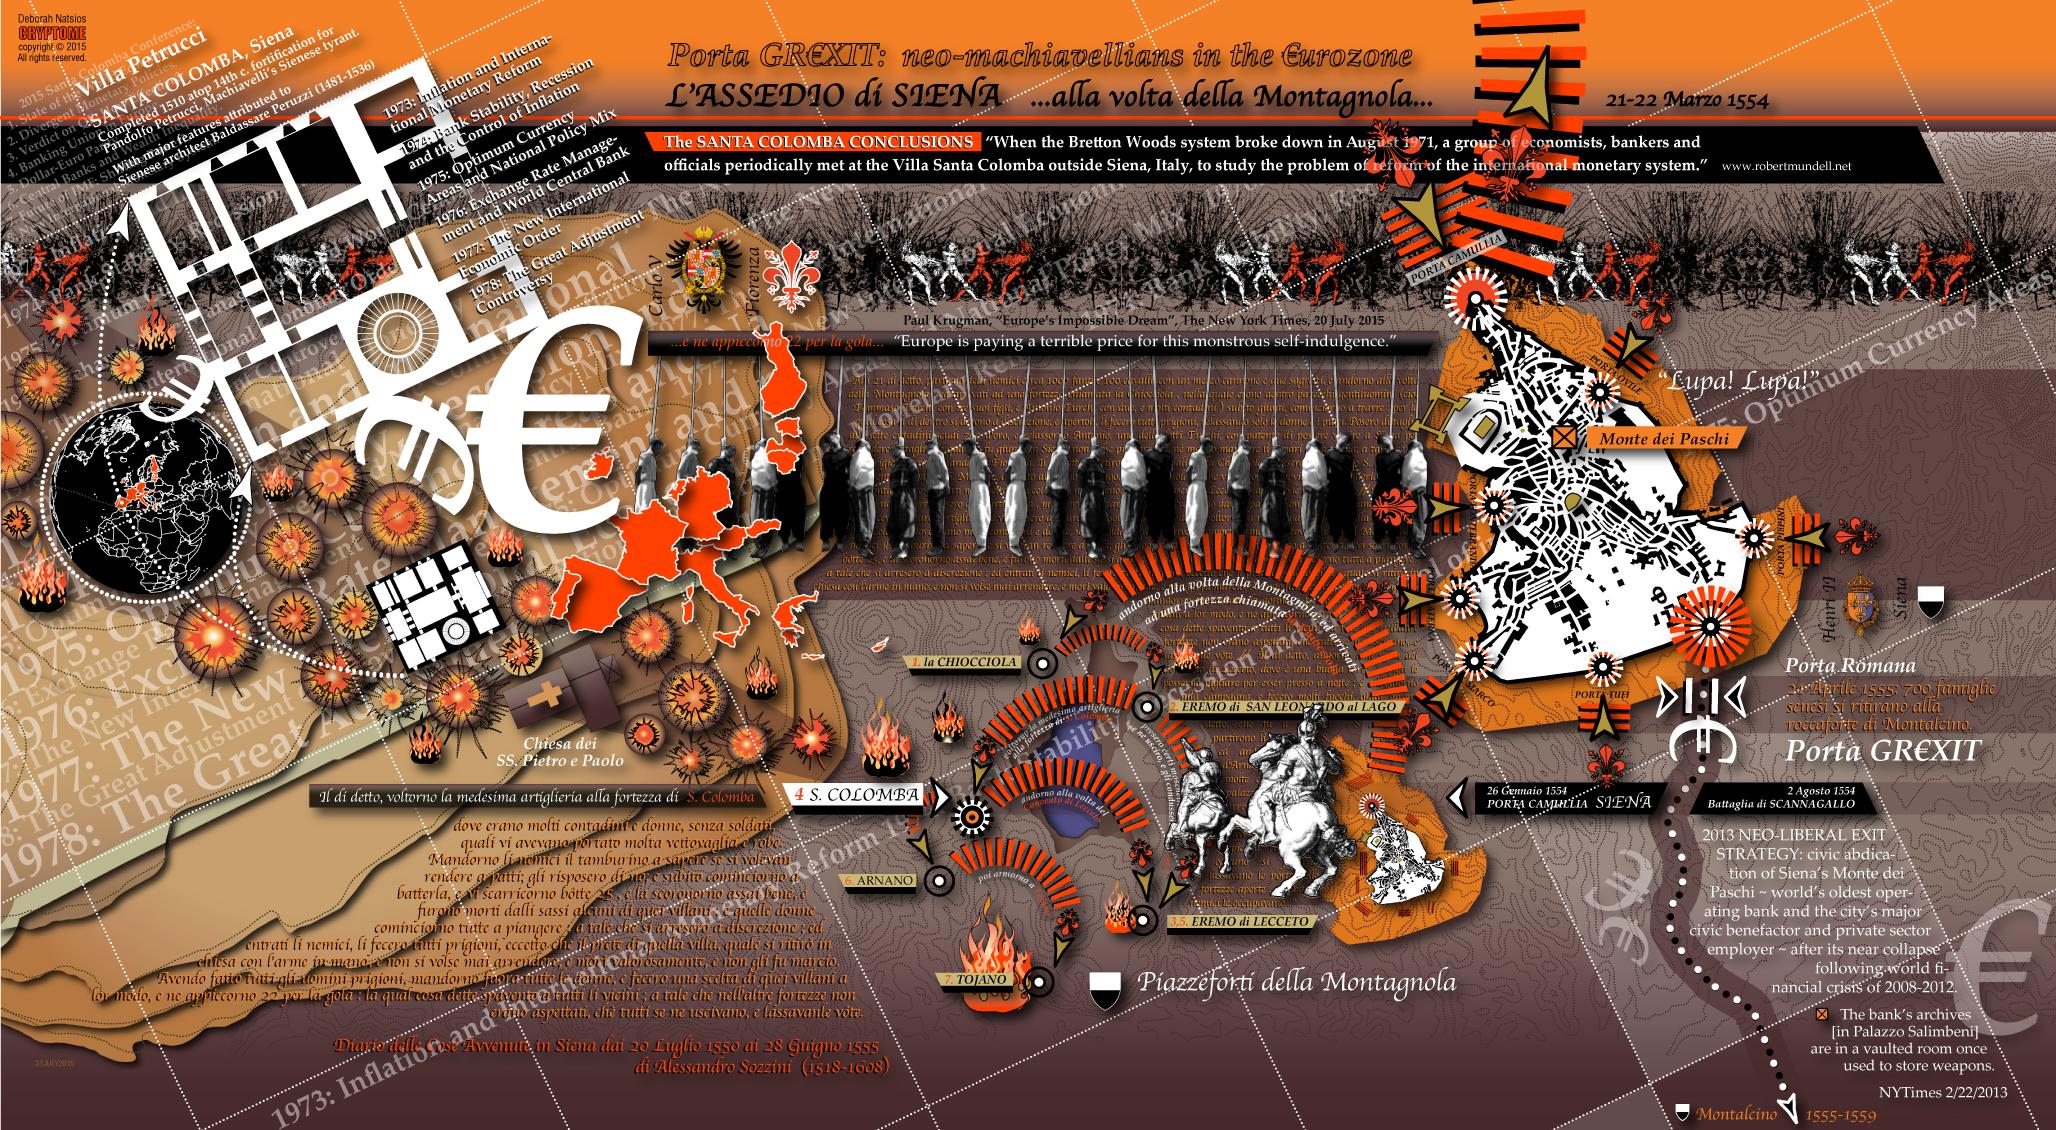 http://cryptome.org/cartome/natsios-eurozone.jpg